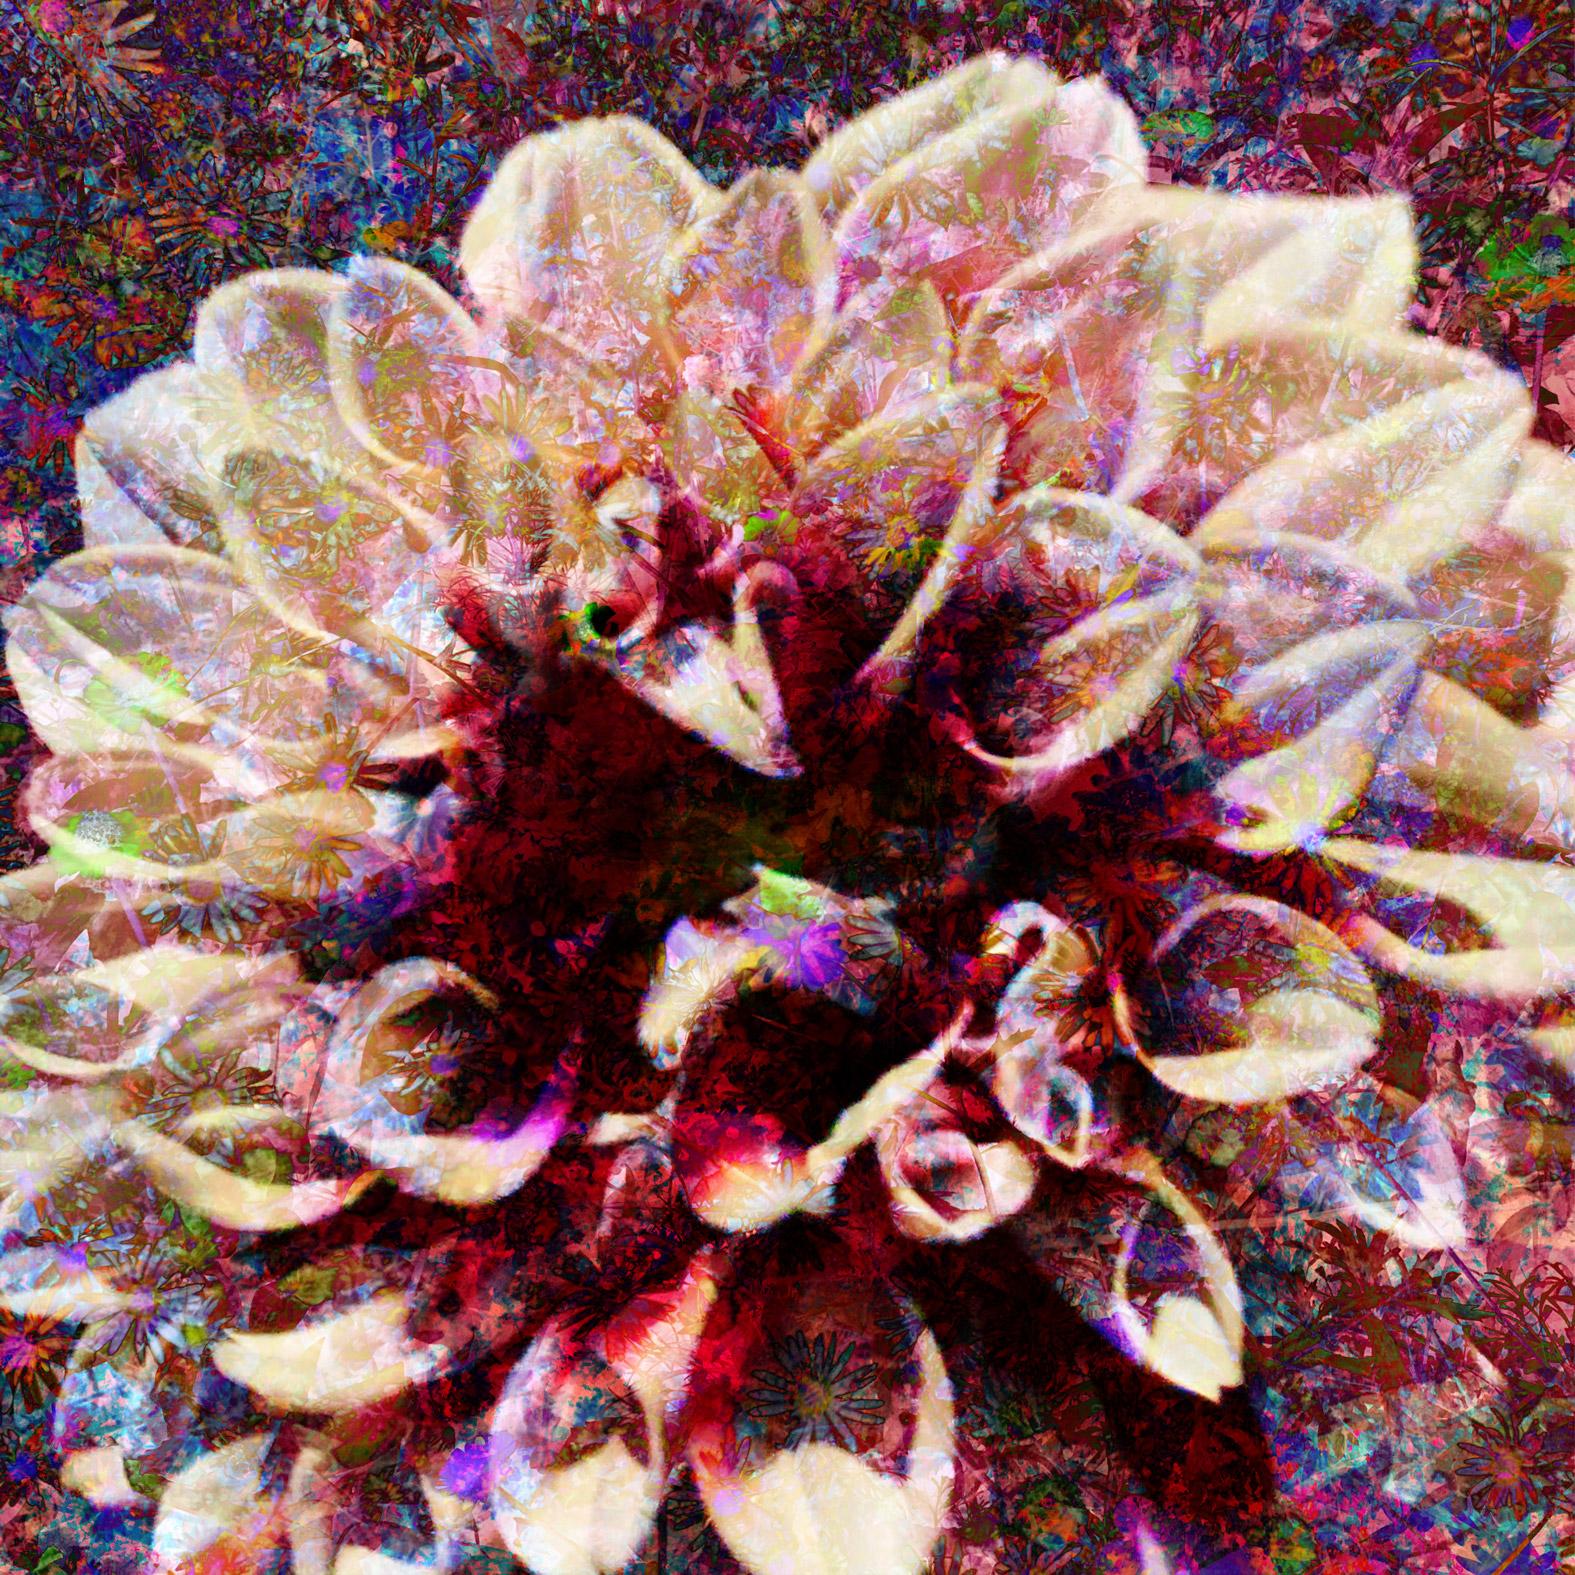 Rosa artwork by Aristo Vopenka - art listed for sale on Artplode